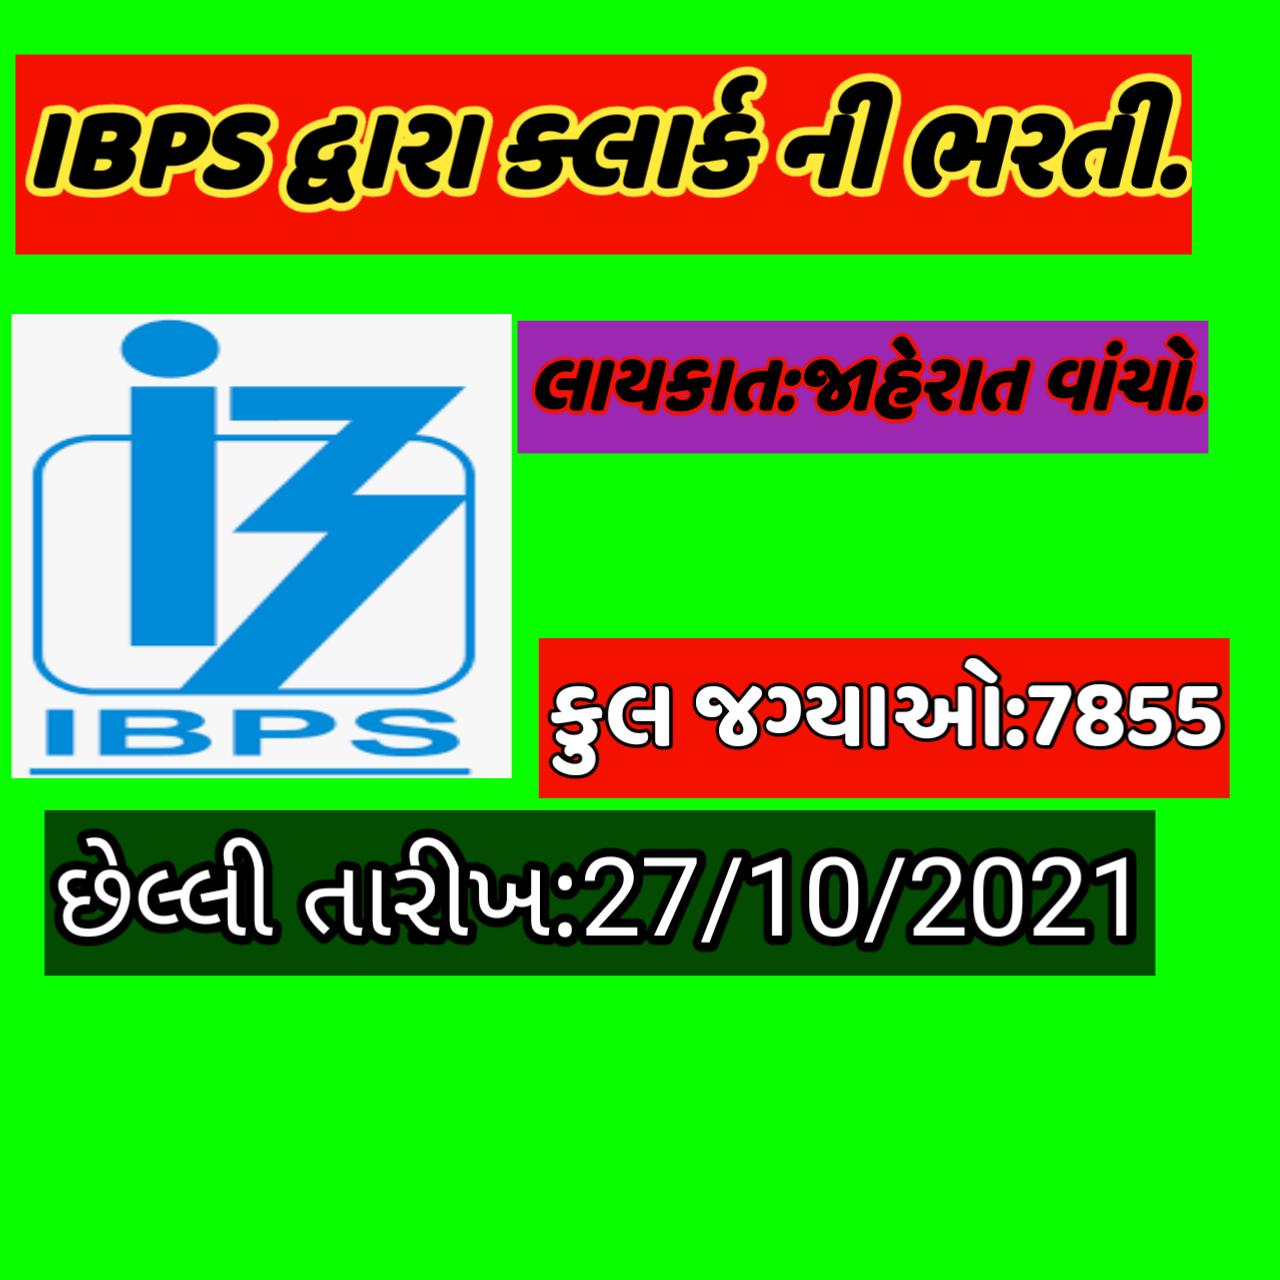 IBPS Clerk Recruitment Notification 2021